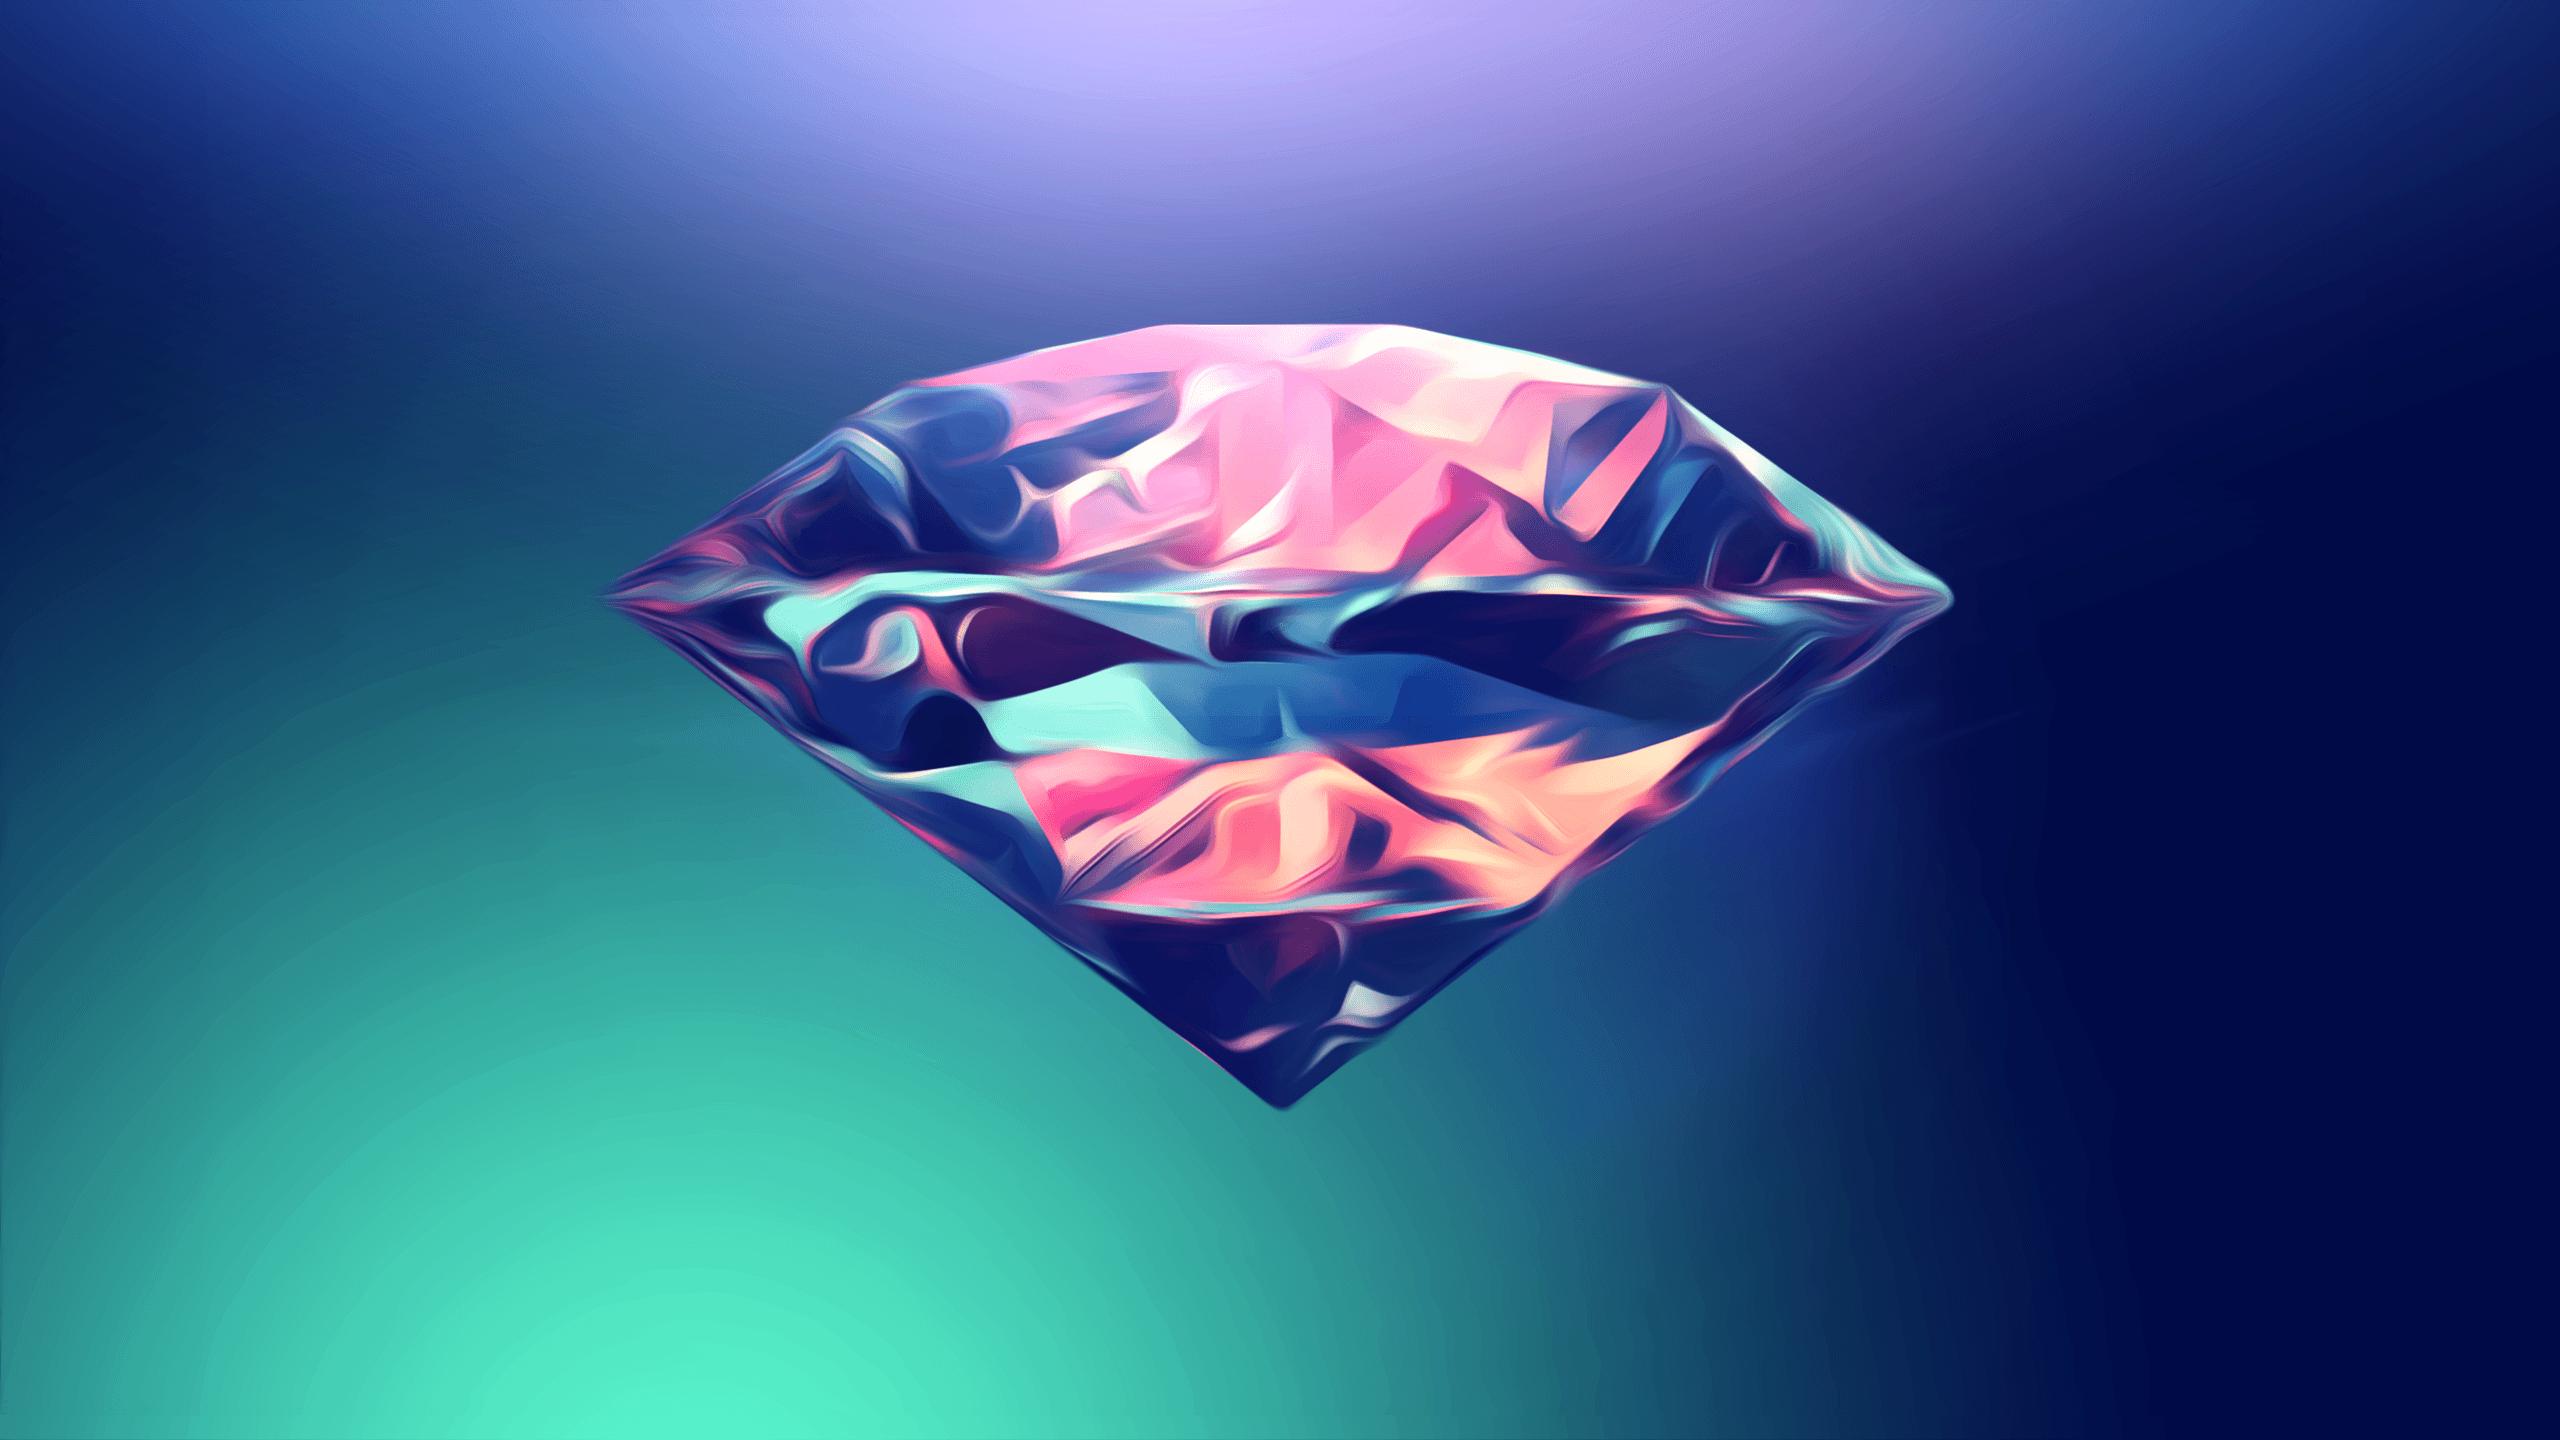 Diamond Desktop Wallpapers Top Free Diamond Desktop Backgrounds